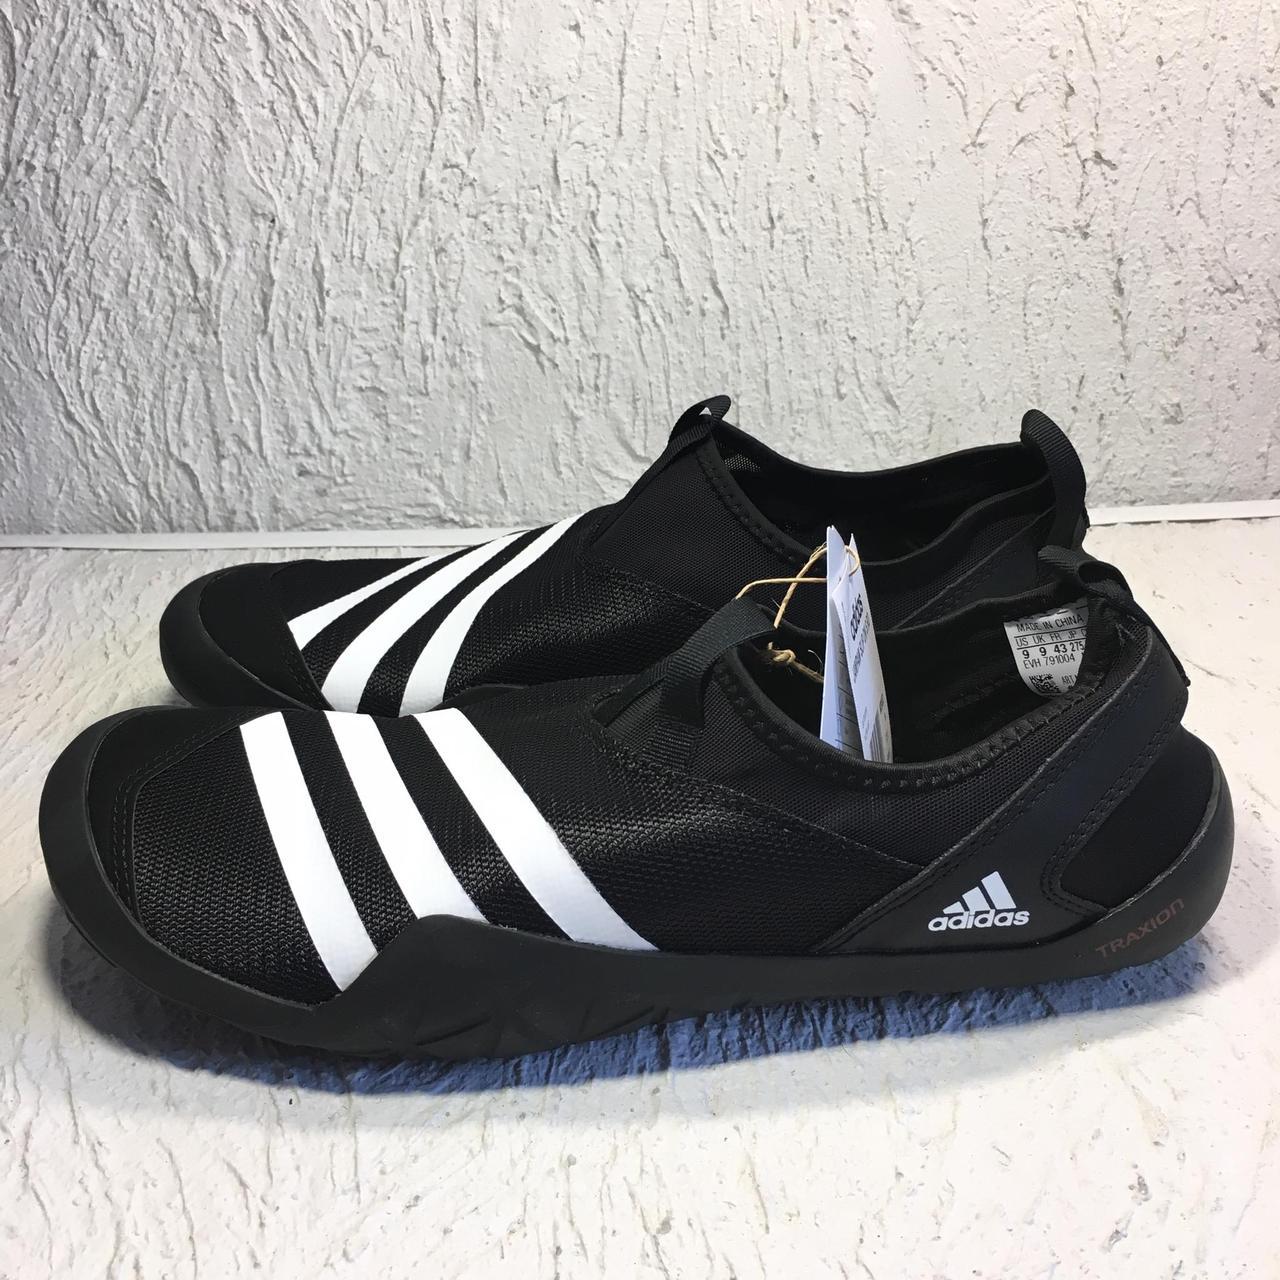 Мужские Коралловые тапочки Adidas Climacool JawPaw M29553 43 размер